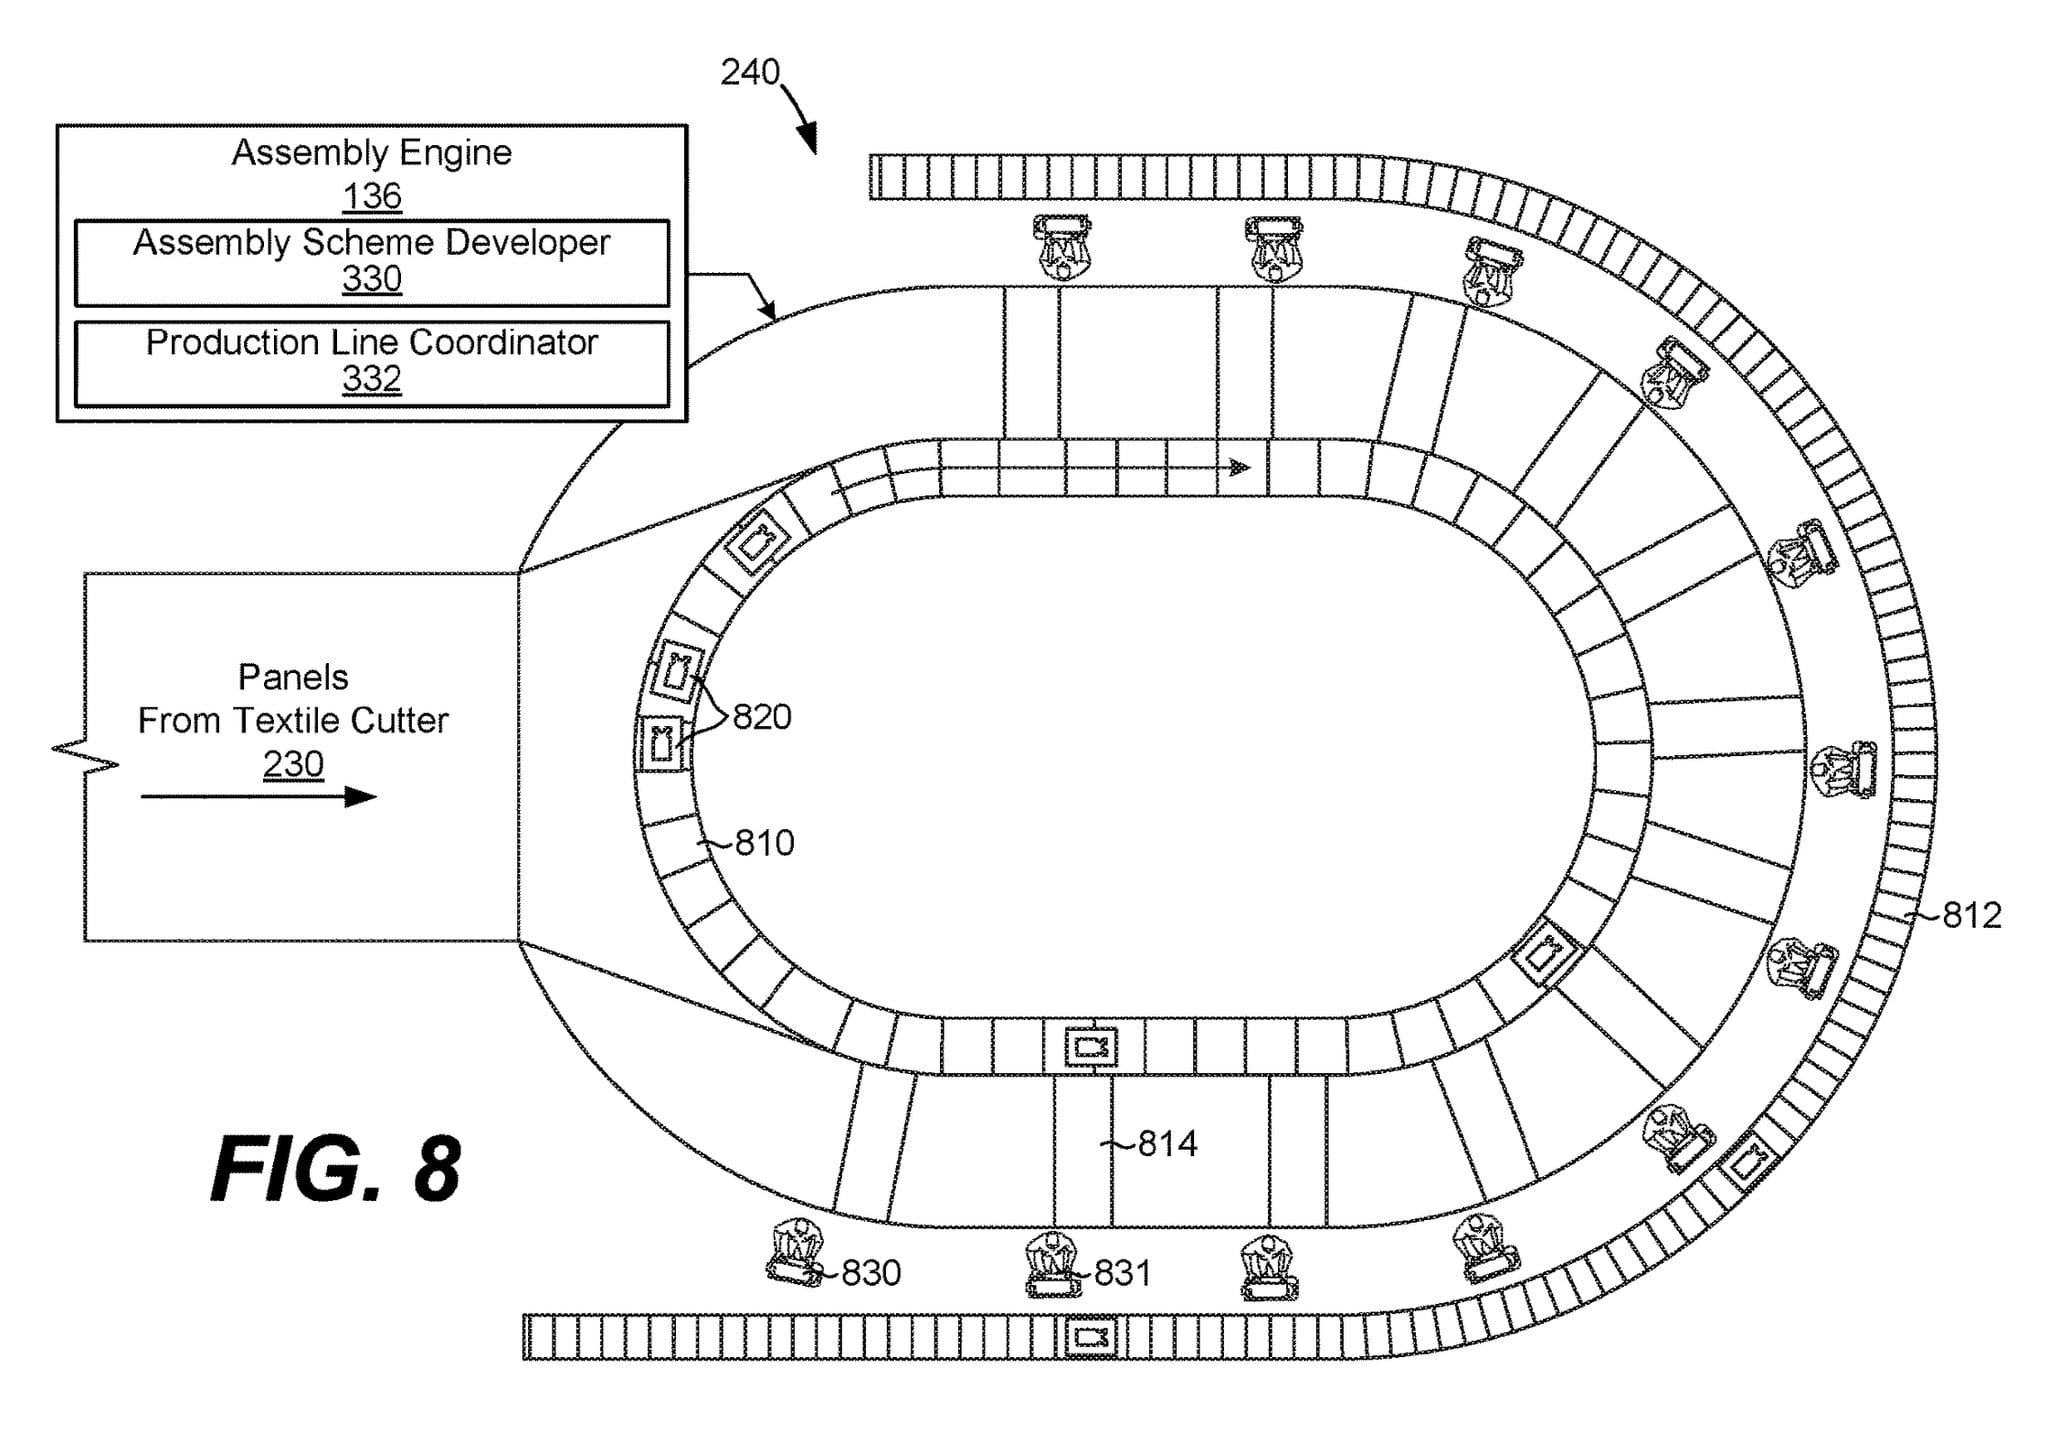 Amazon patenteou o projeto de sua fábrica automatizada de roupas sob demanda stylo urbano-5